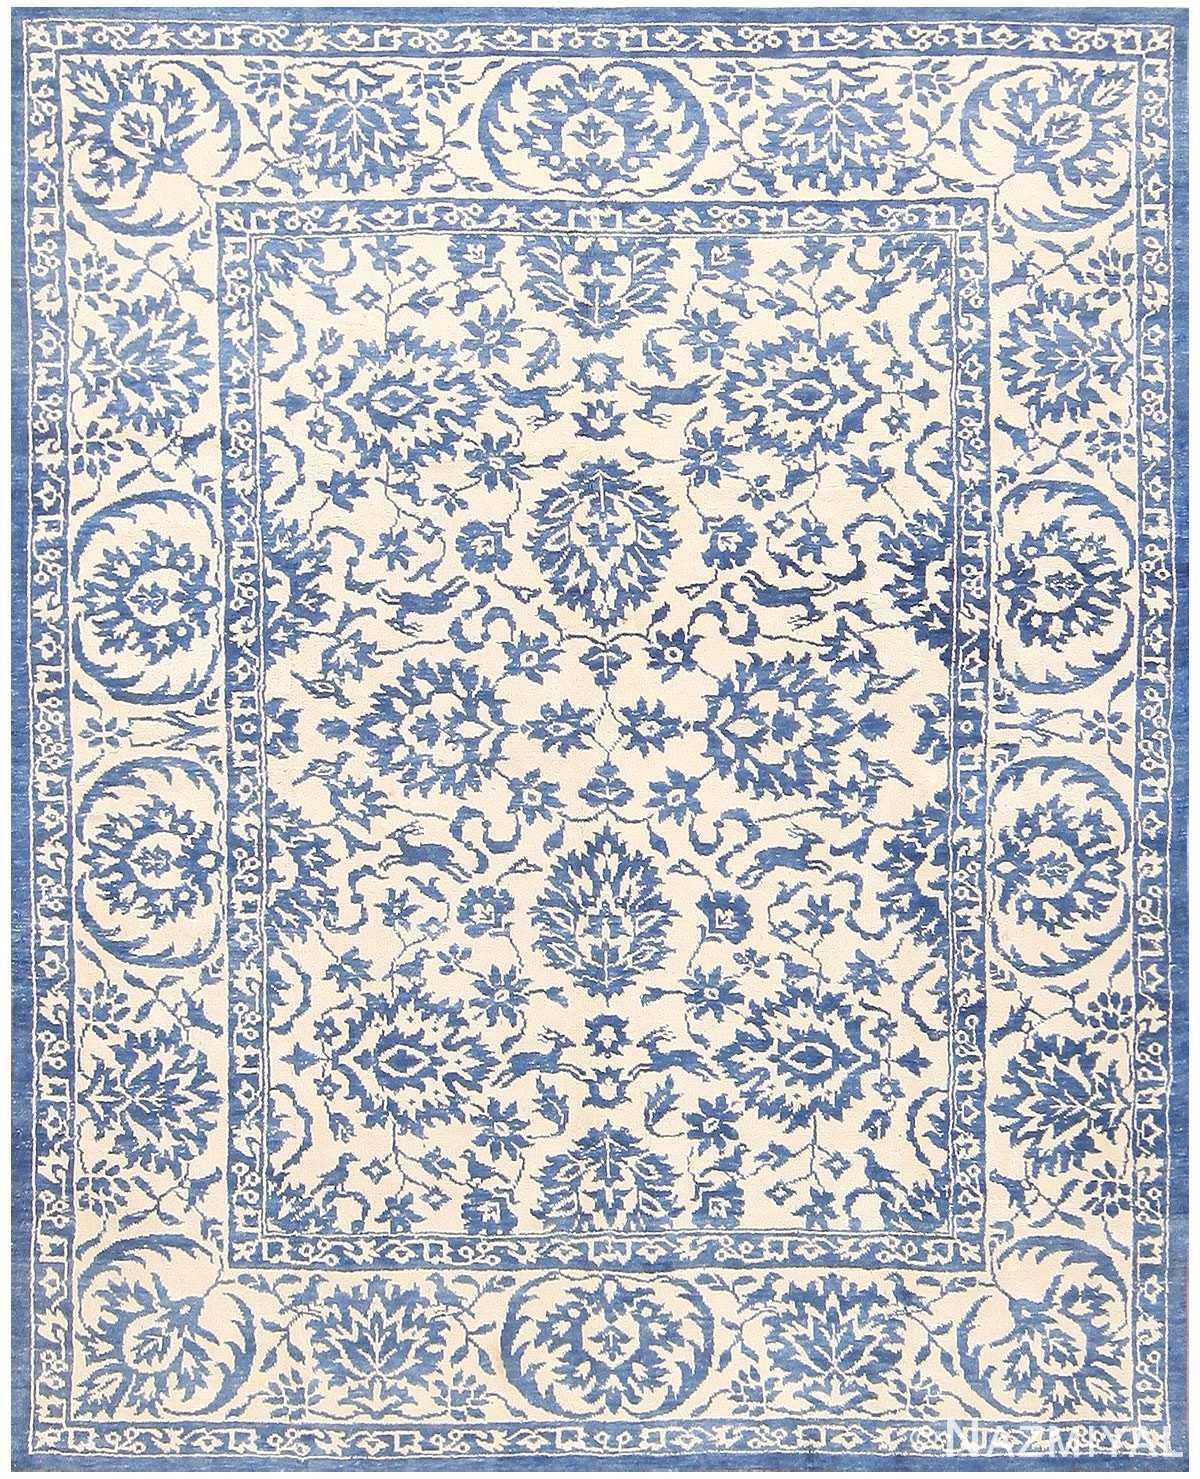 Vintage Cotton Indian Agra Rug 48324 Detail/Large View